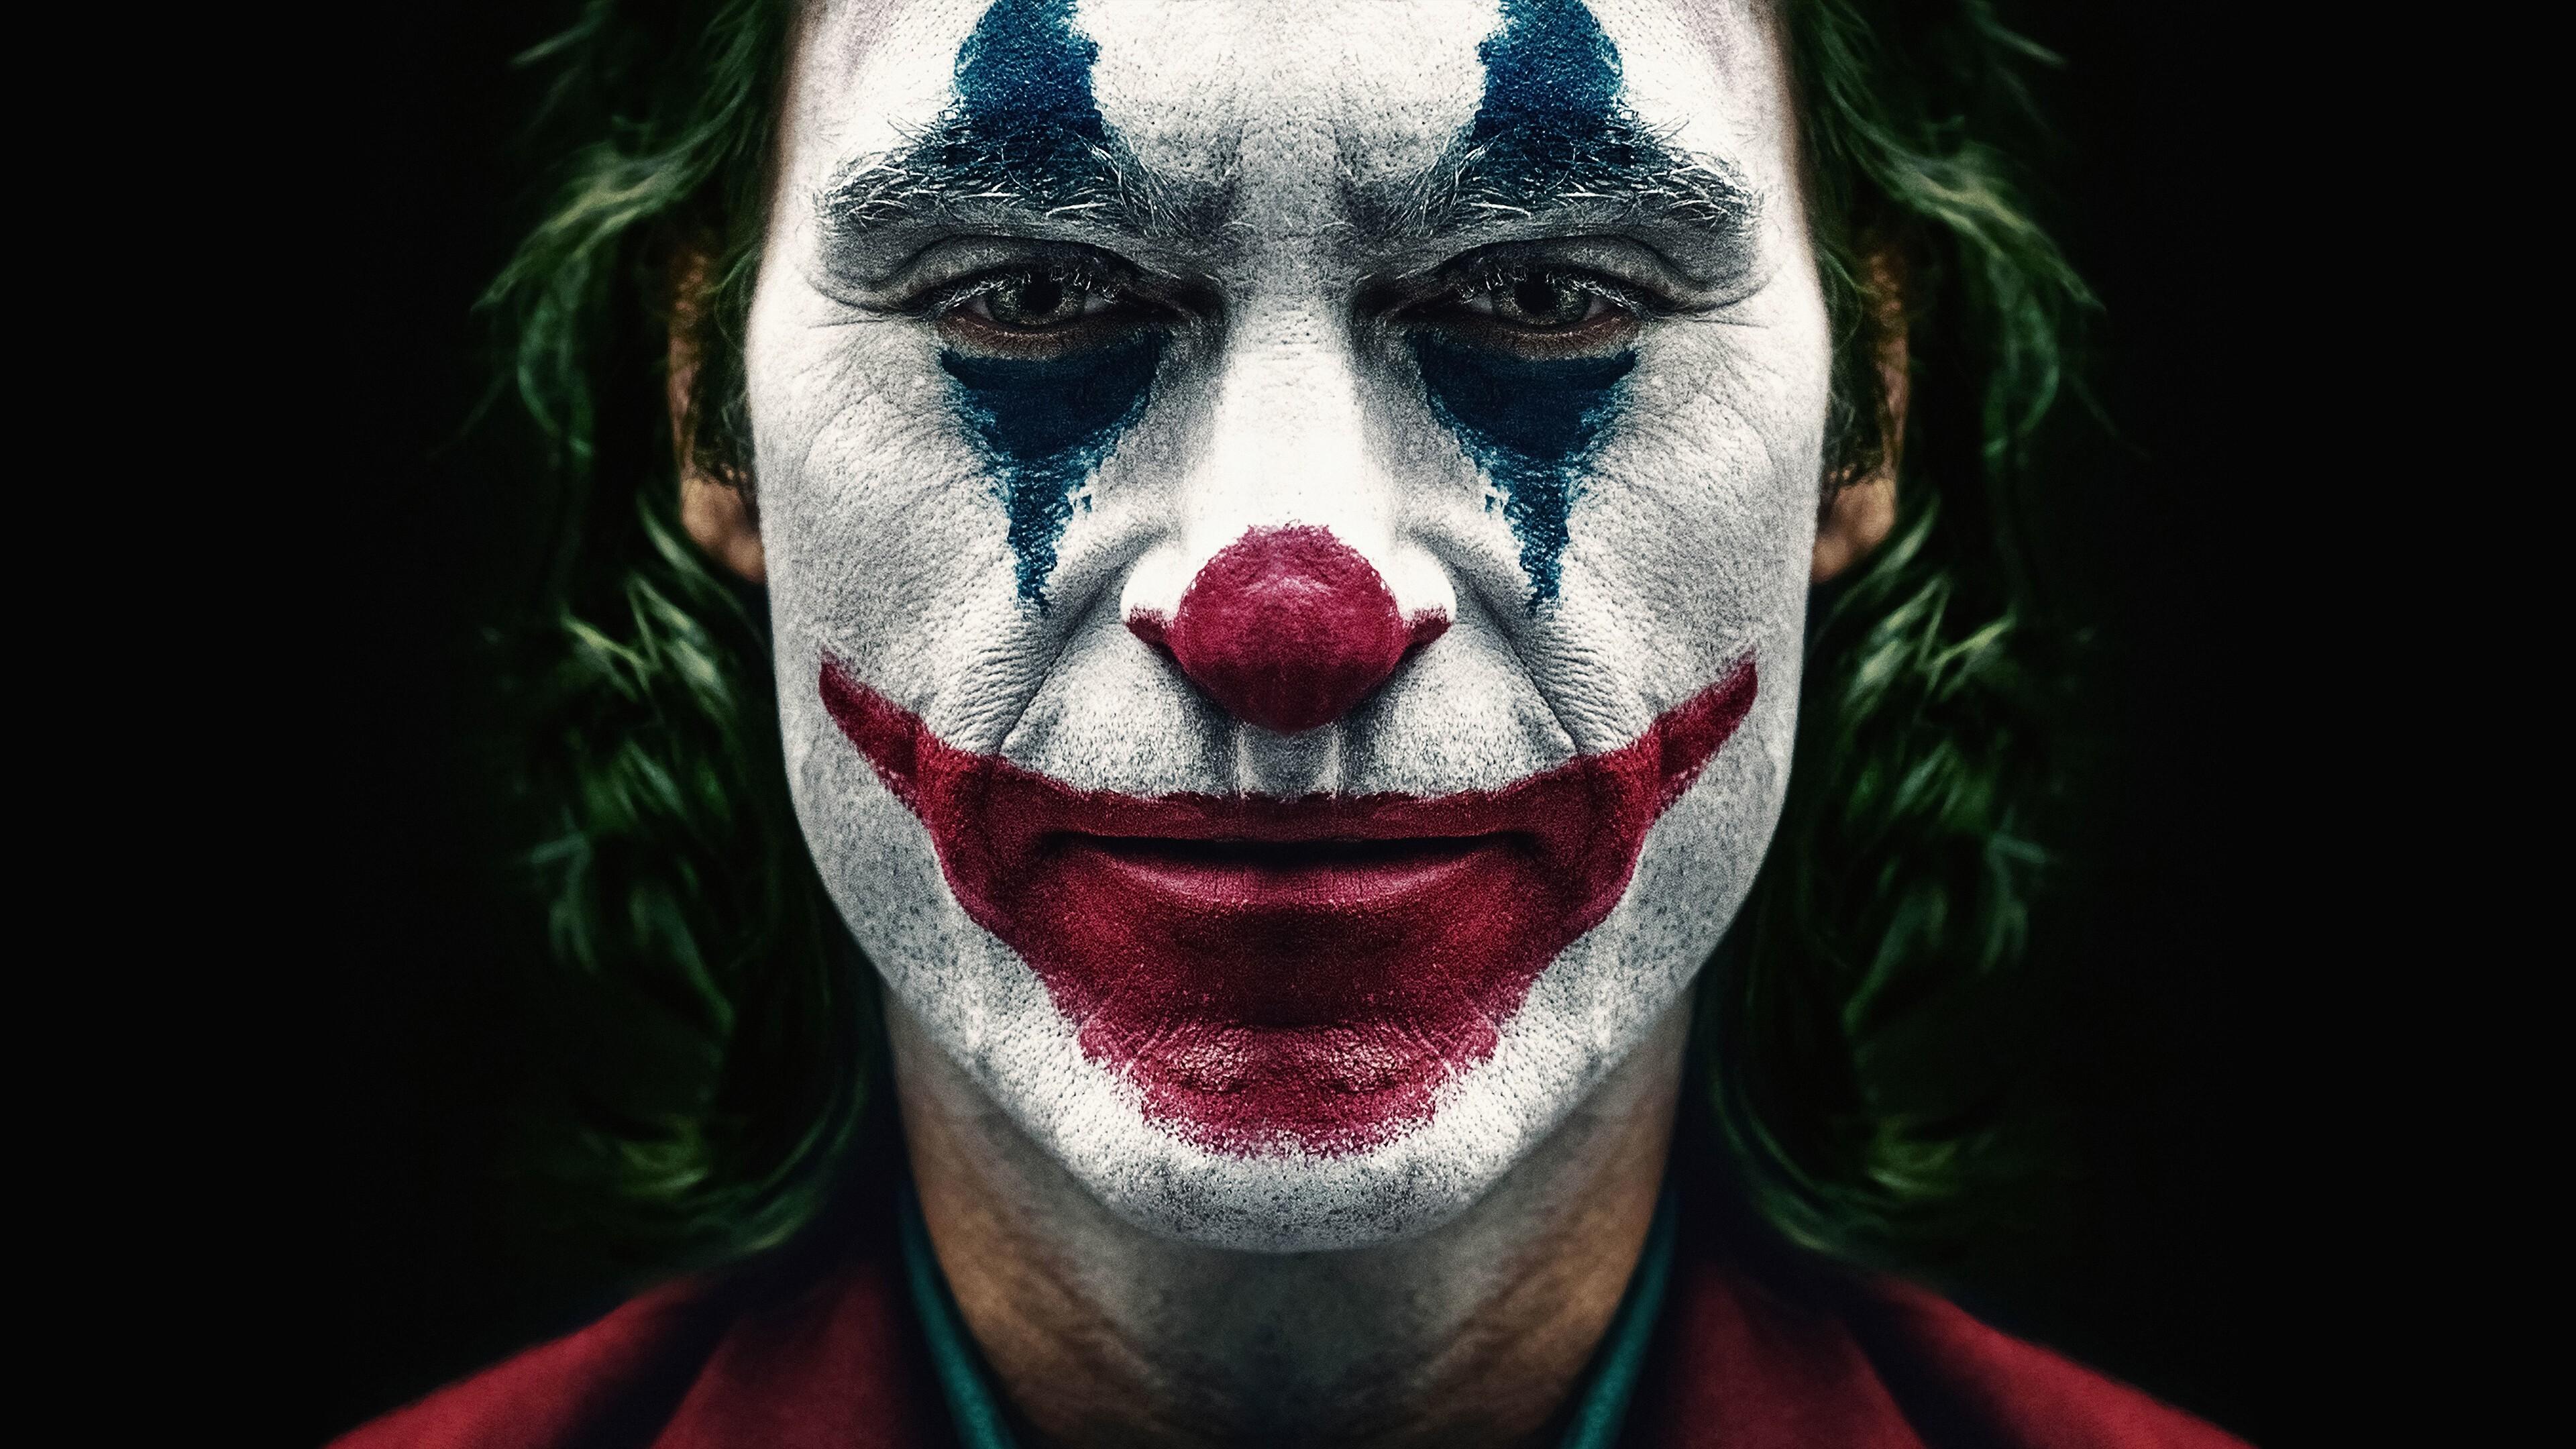 joker 2019 joaquin phoenix clown 5c